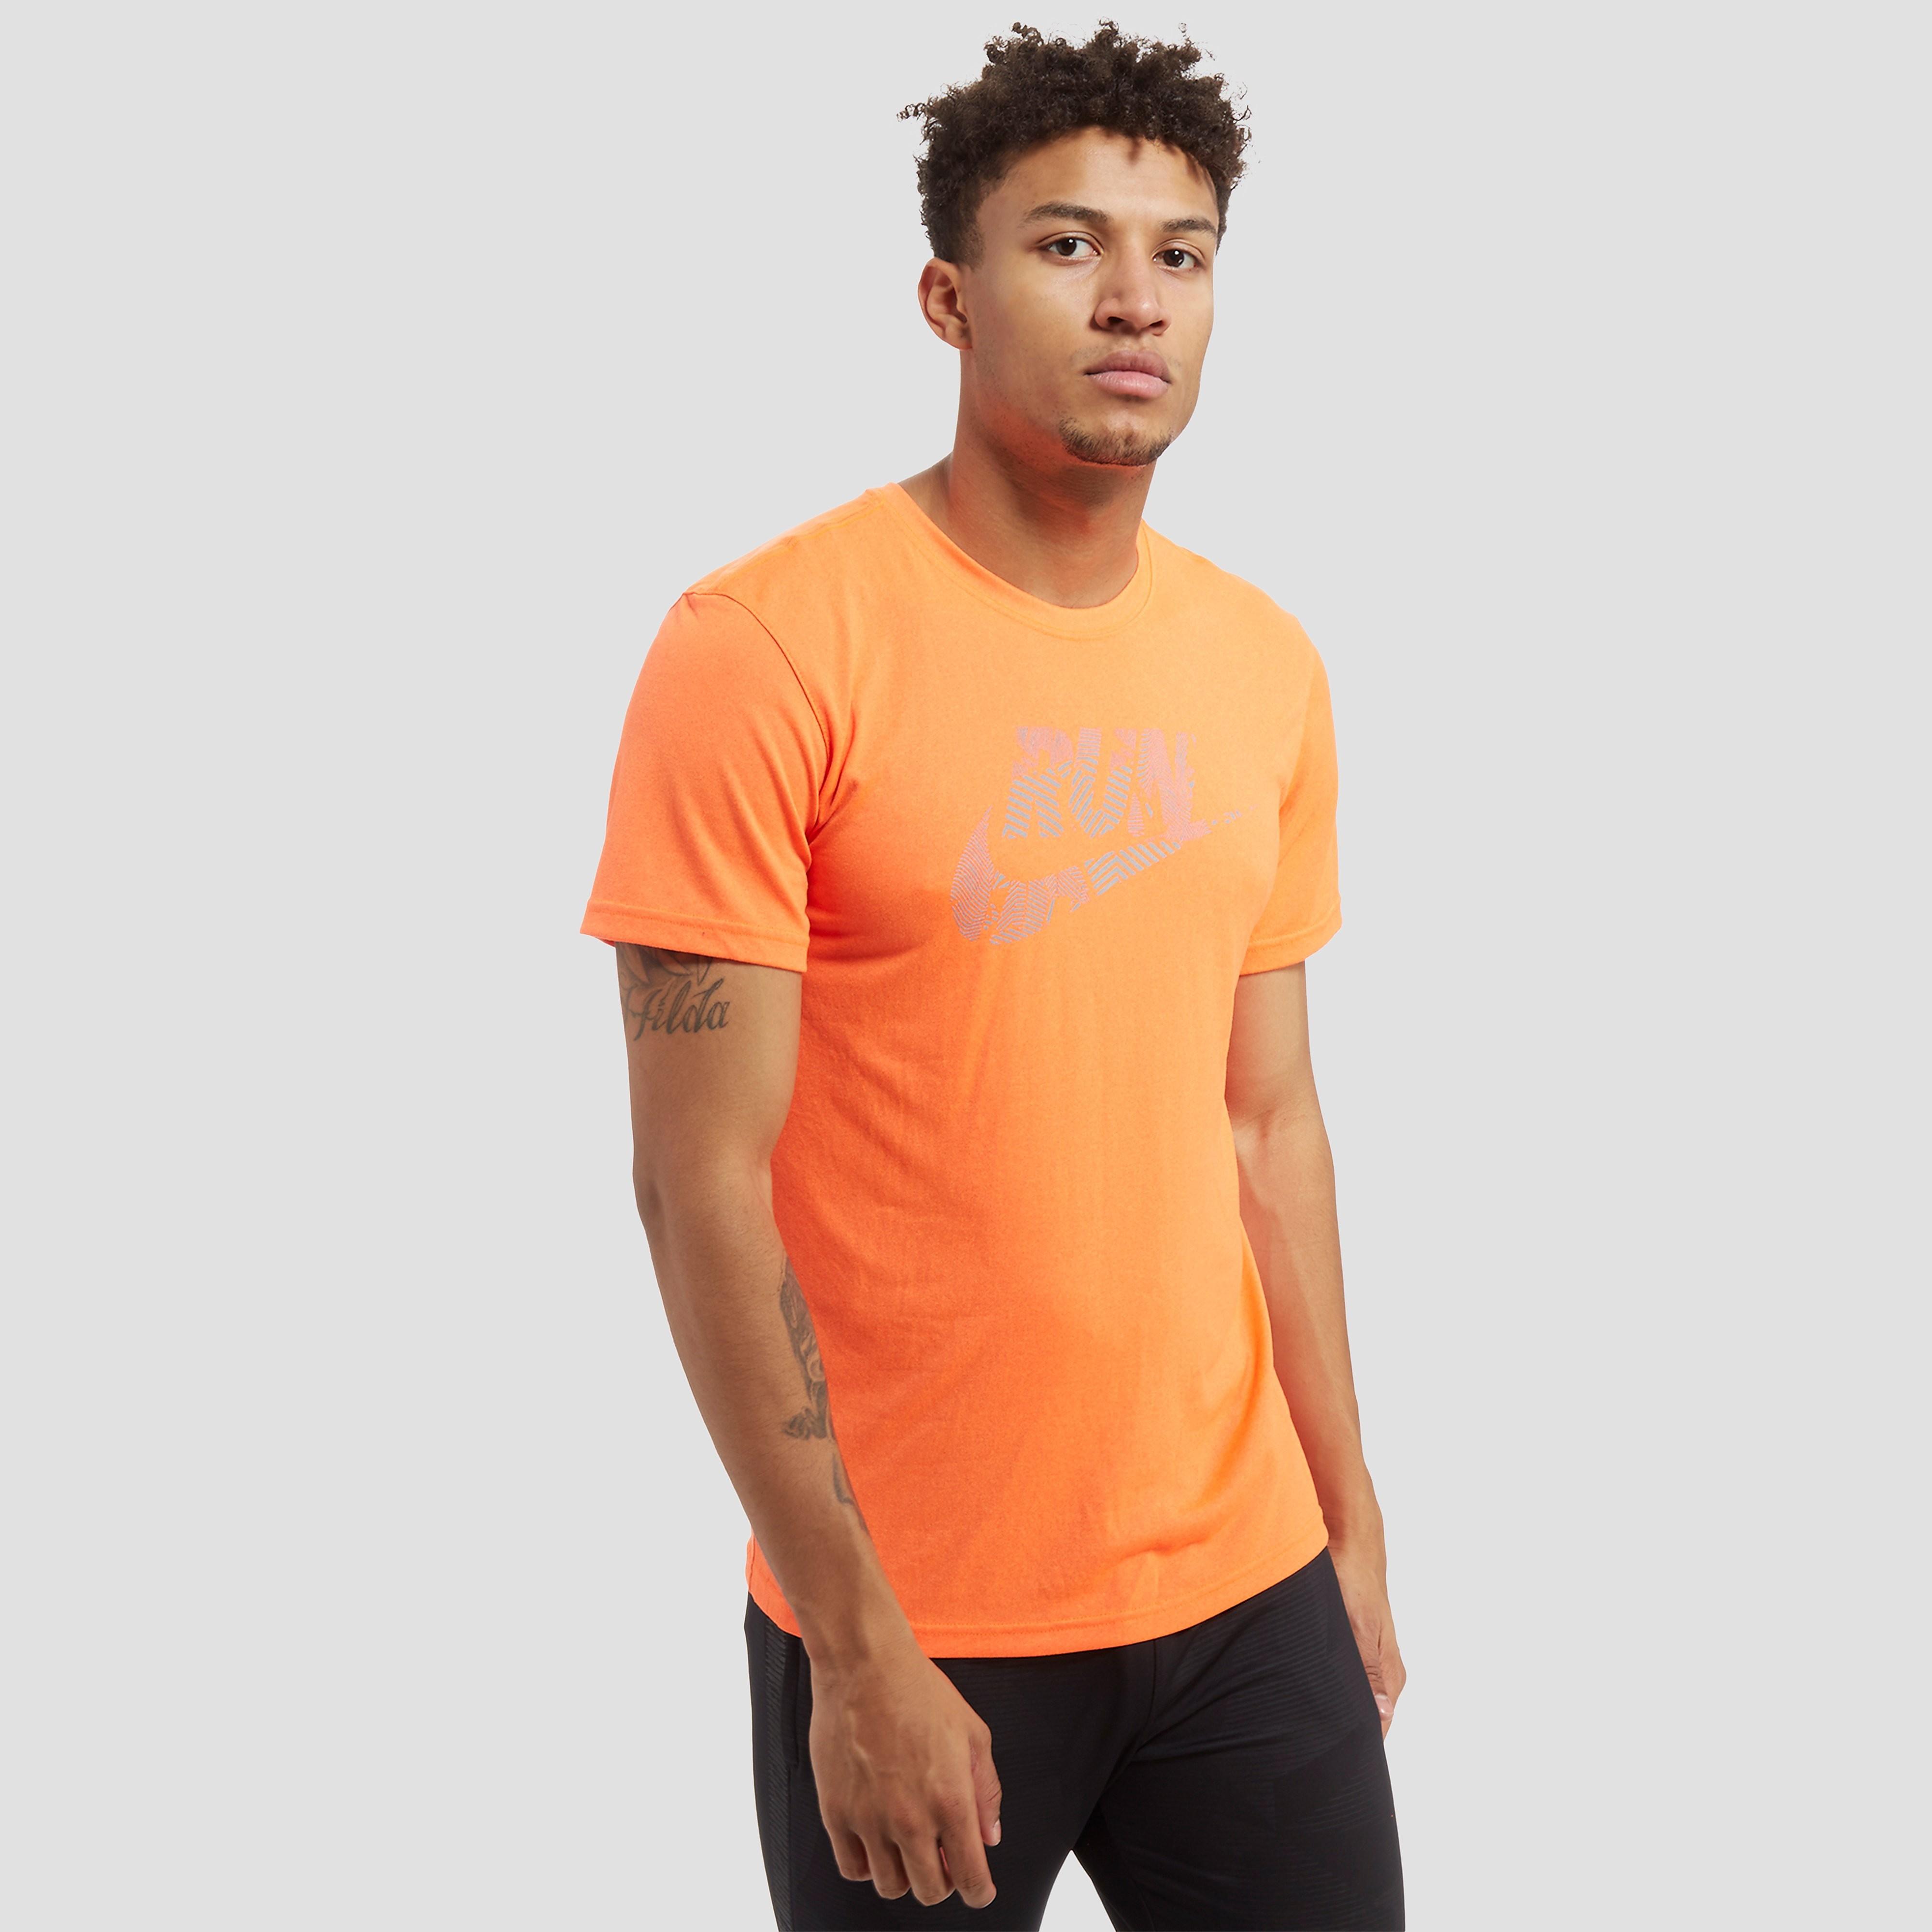 Nike Legend SST Men's T-Shirt